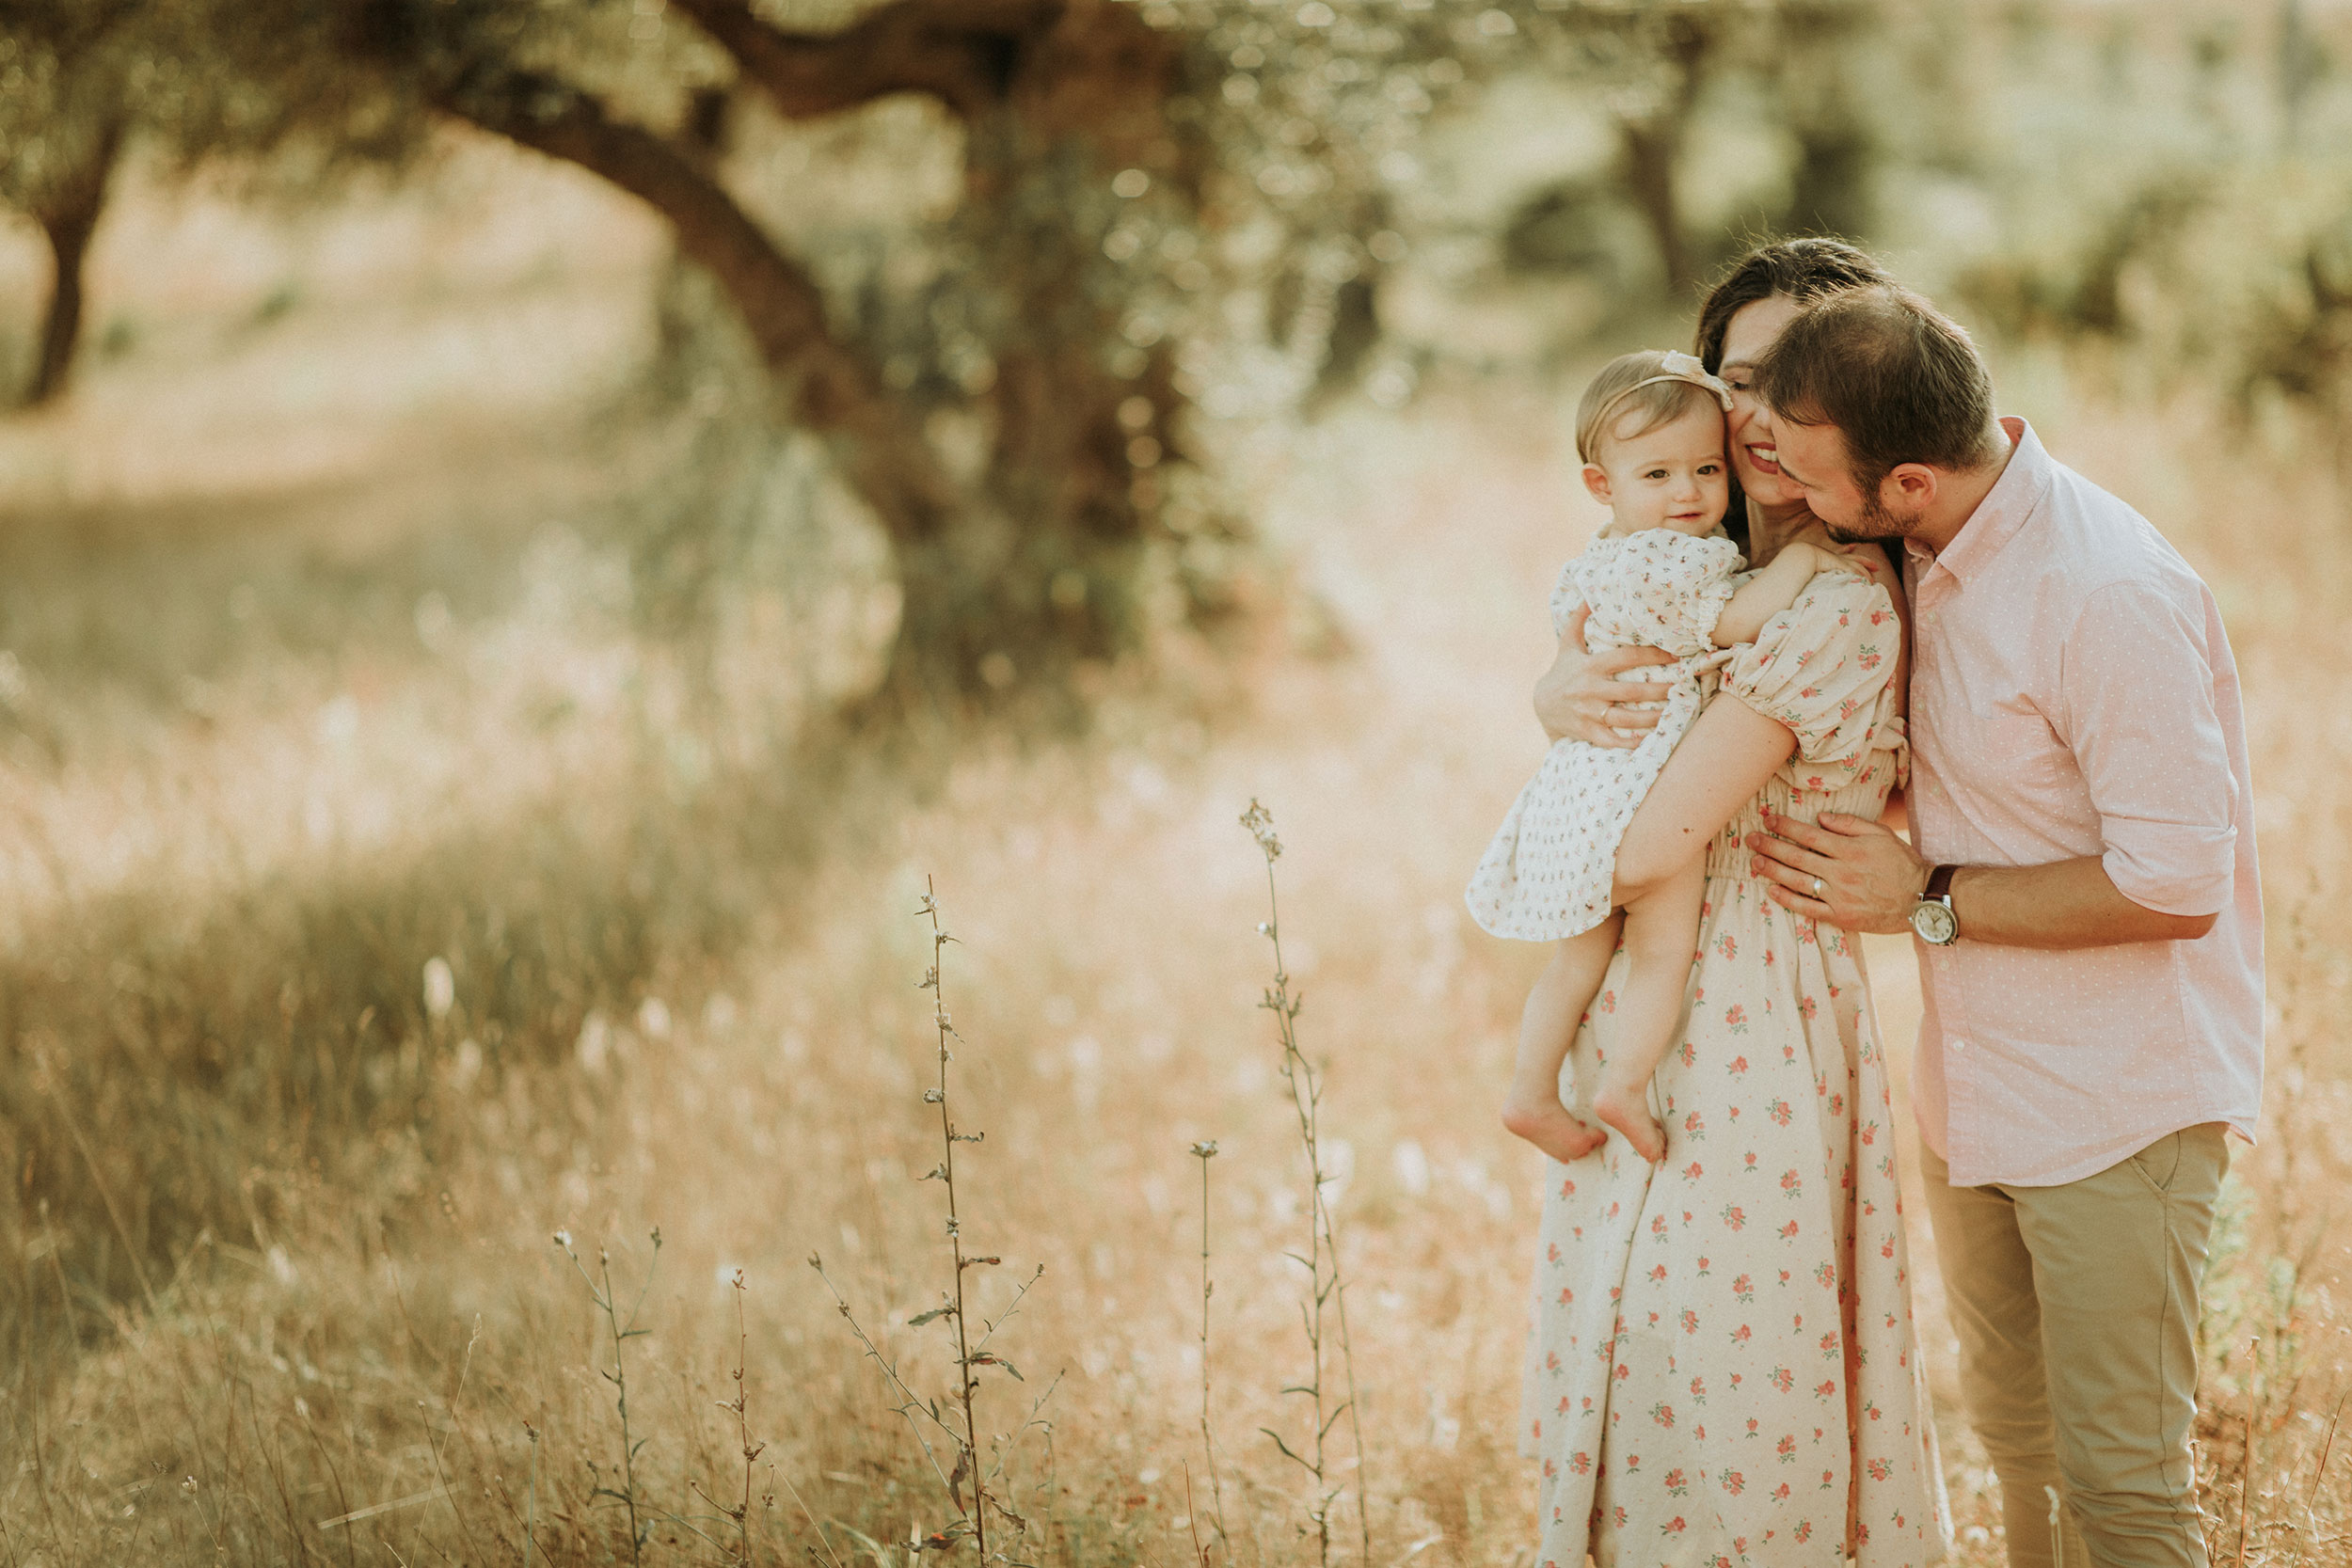 A family of three nature photoshoot